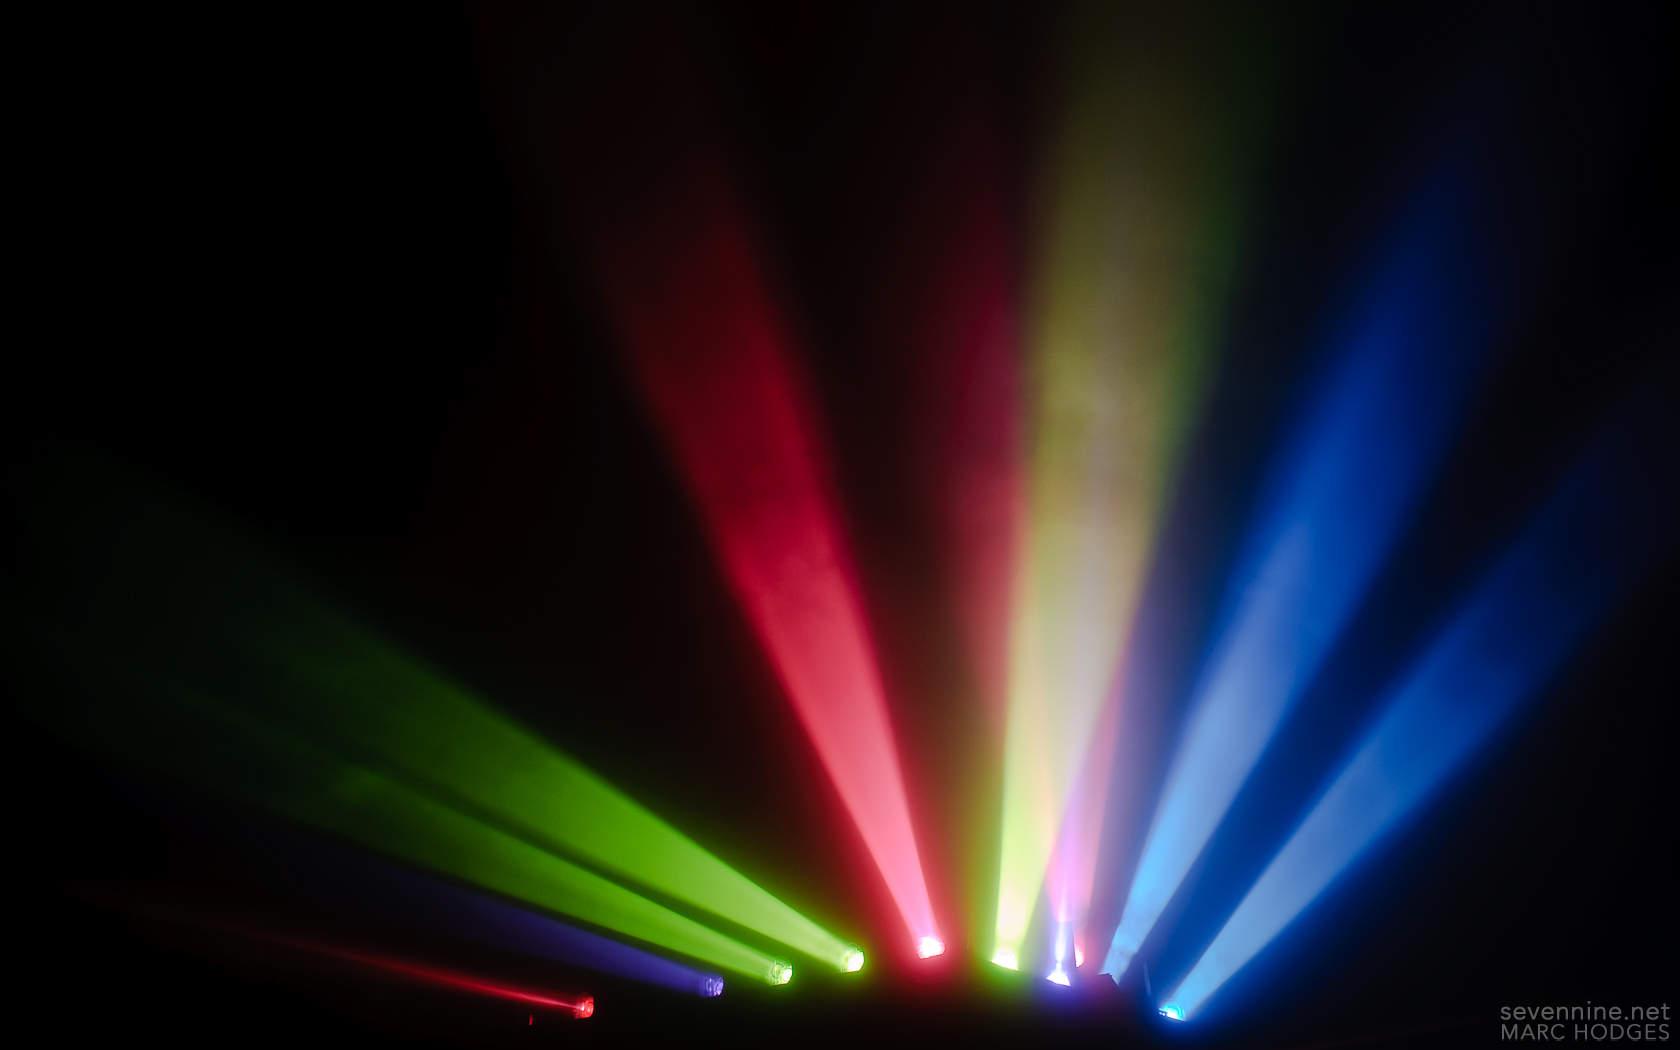 Coloured Spotlights In The Fog